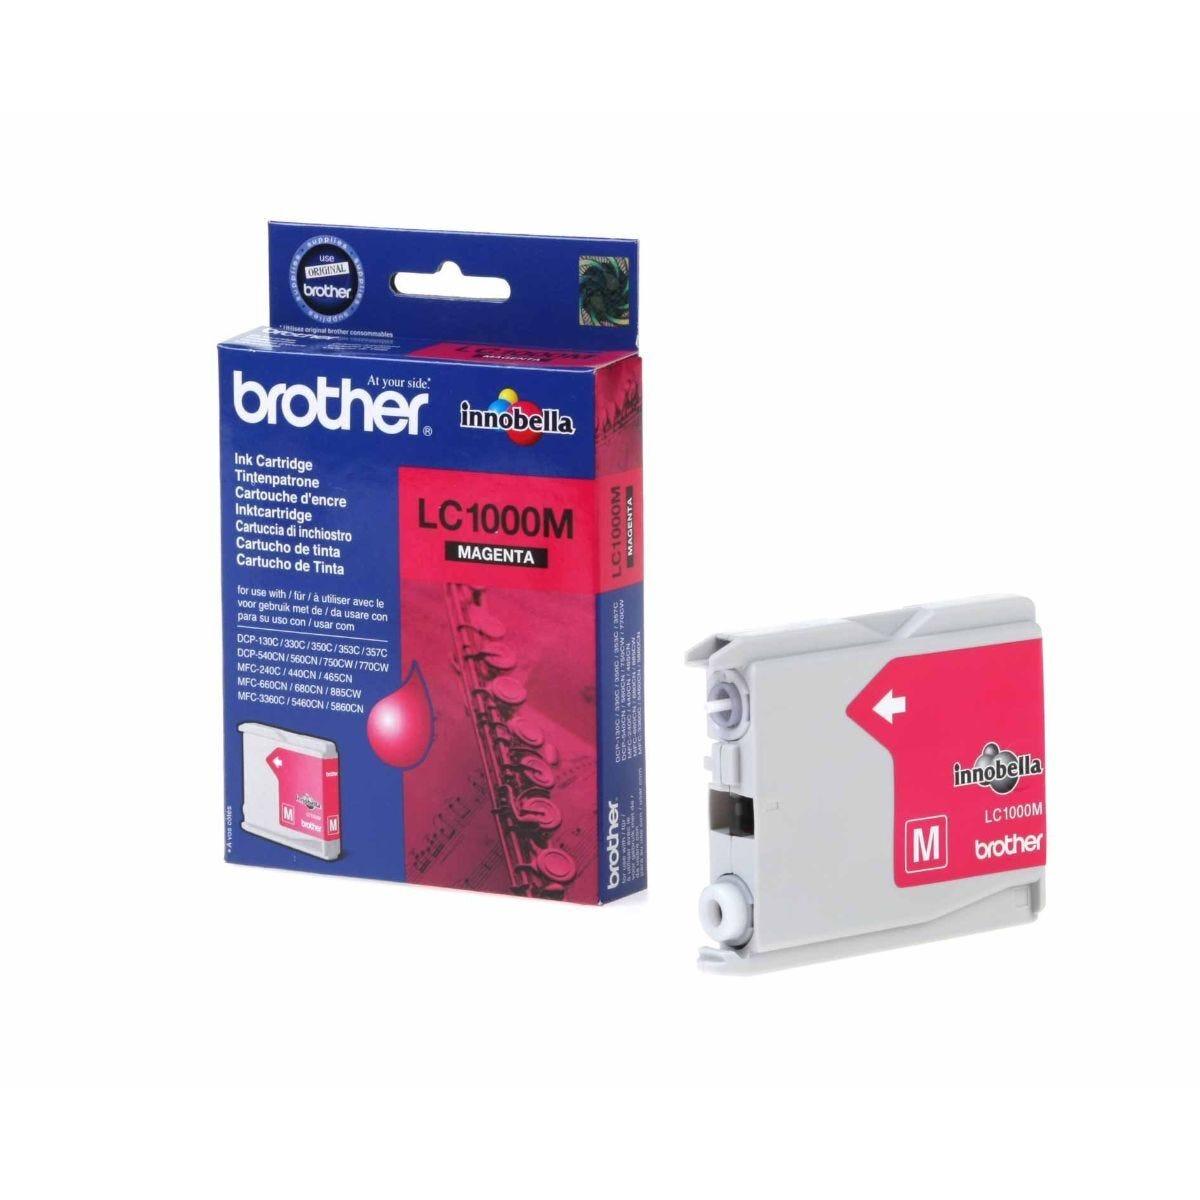 Brother LC1000 Ink Cartridge Magenta